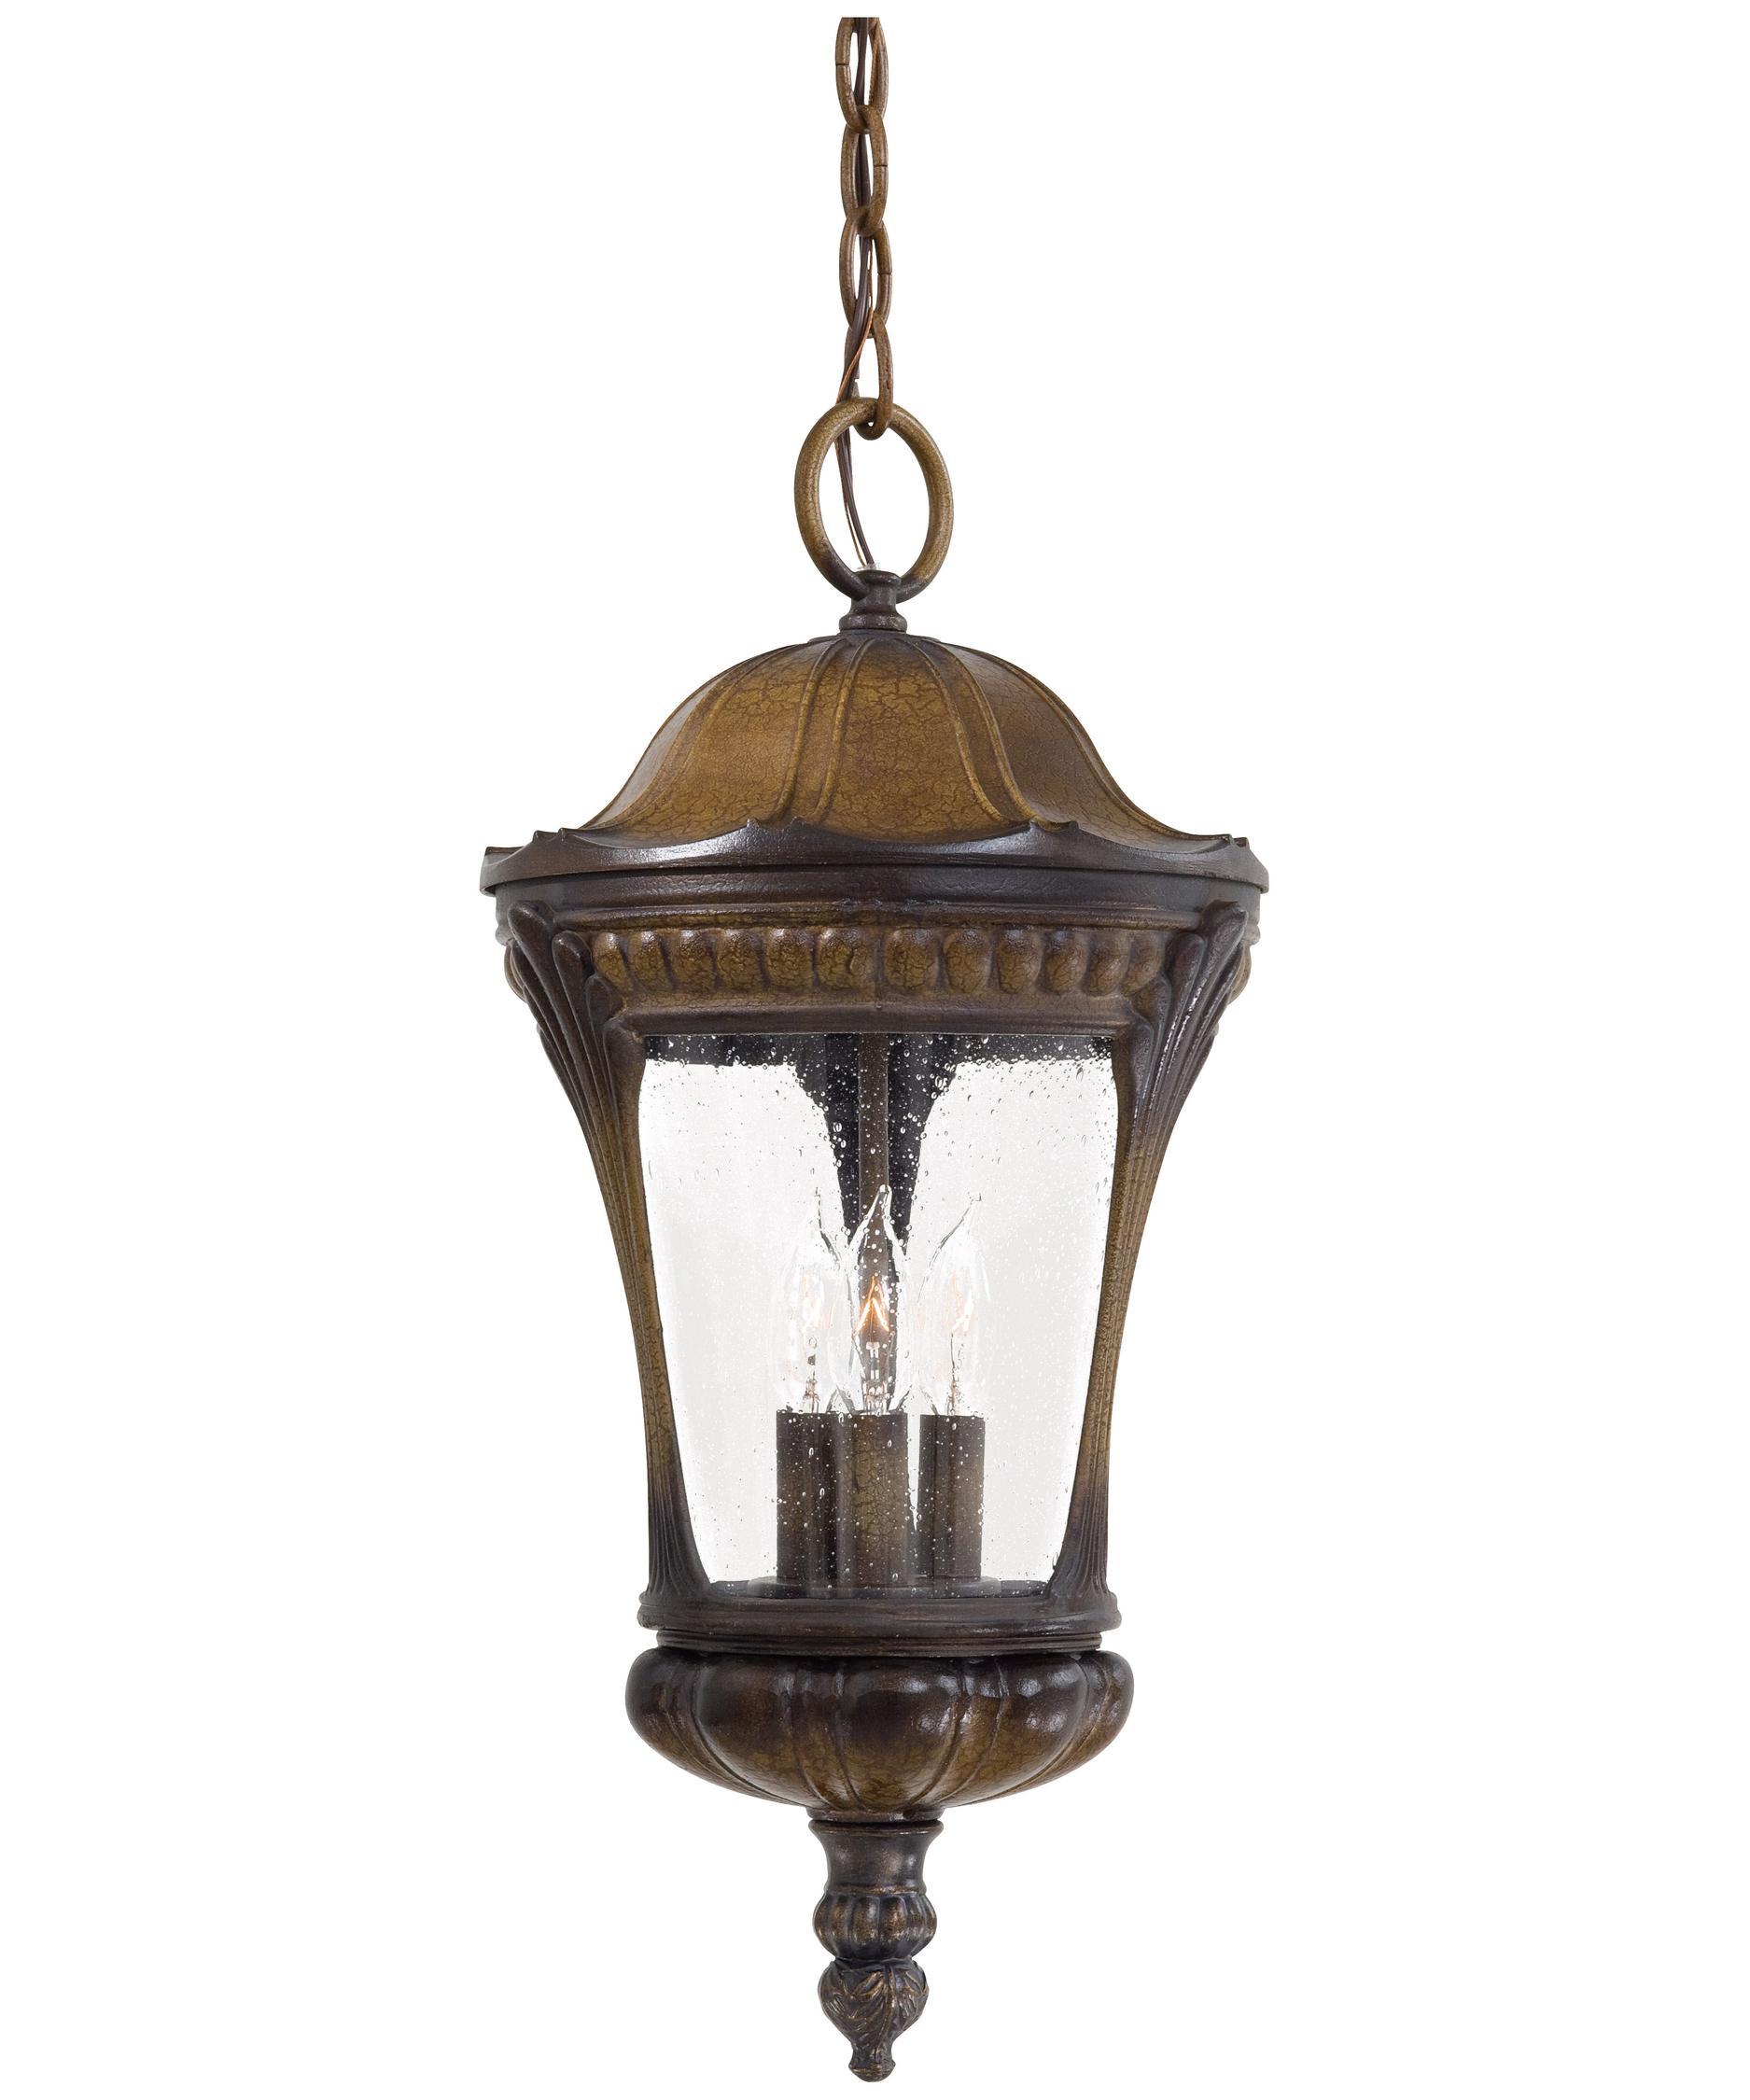 Minka Lavery 9144 Kent Place 10 Inch Wide 3 Light Outdoor Hanging Lantern |  Capitol Lighting 1 800lighting.com